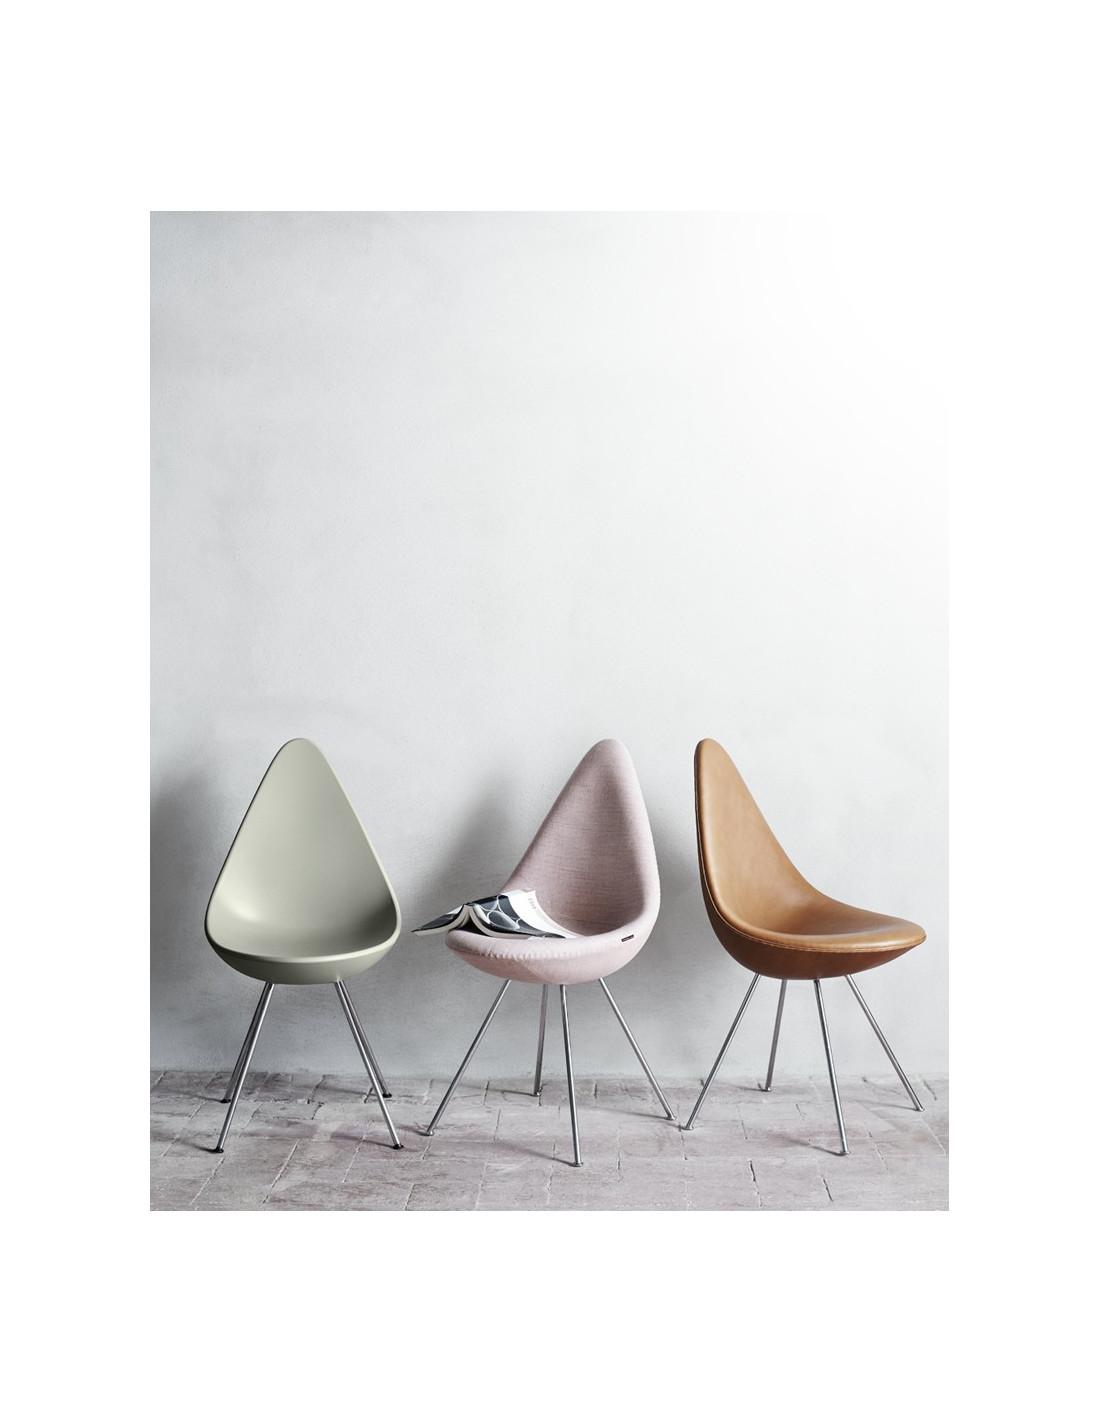 Drop Chair Arne Jacobsen Fritz Hansen